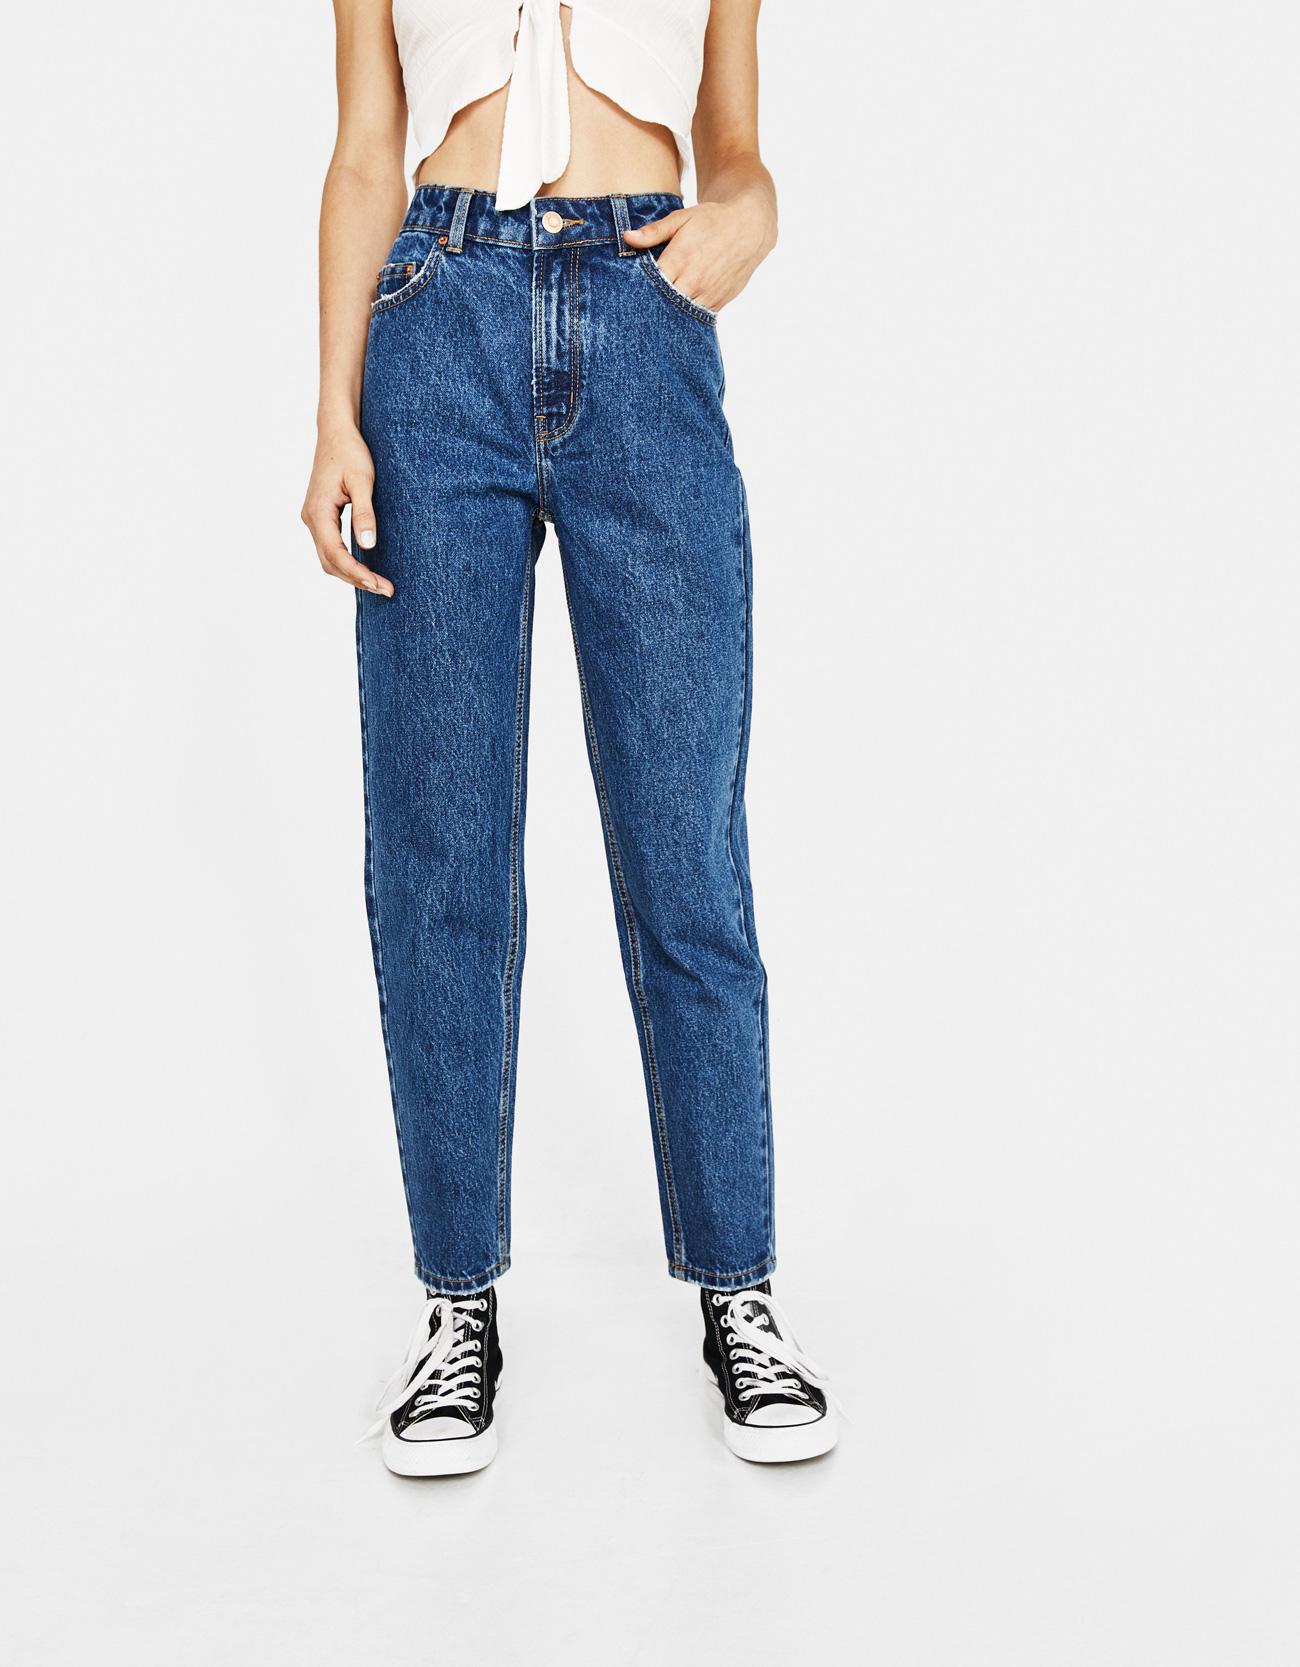 5bc73f89 High waist mom jeans - High Rise - Bershka Singapore